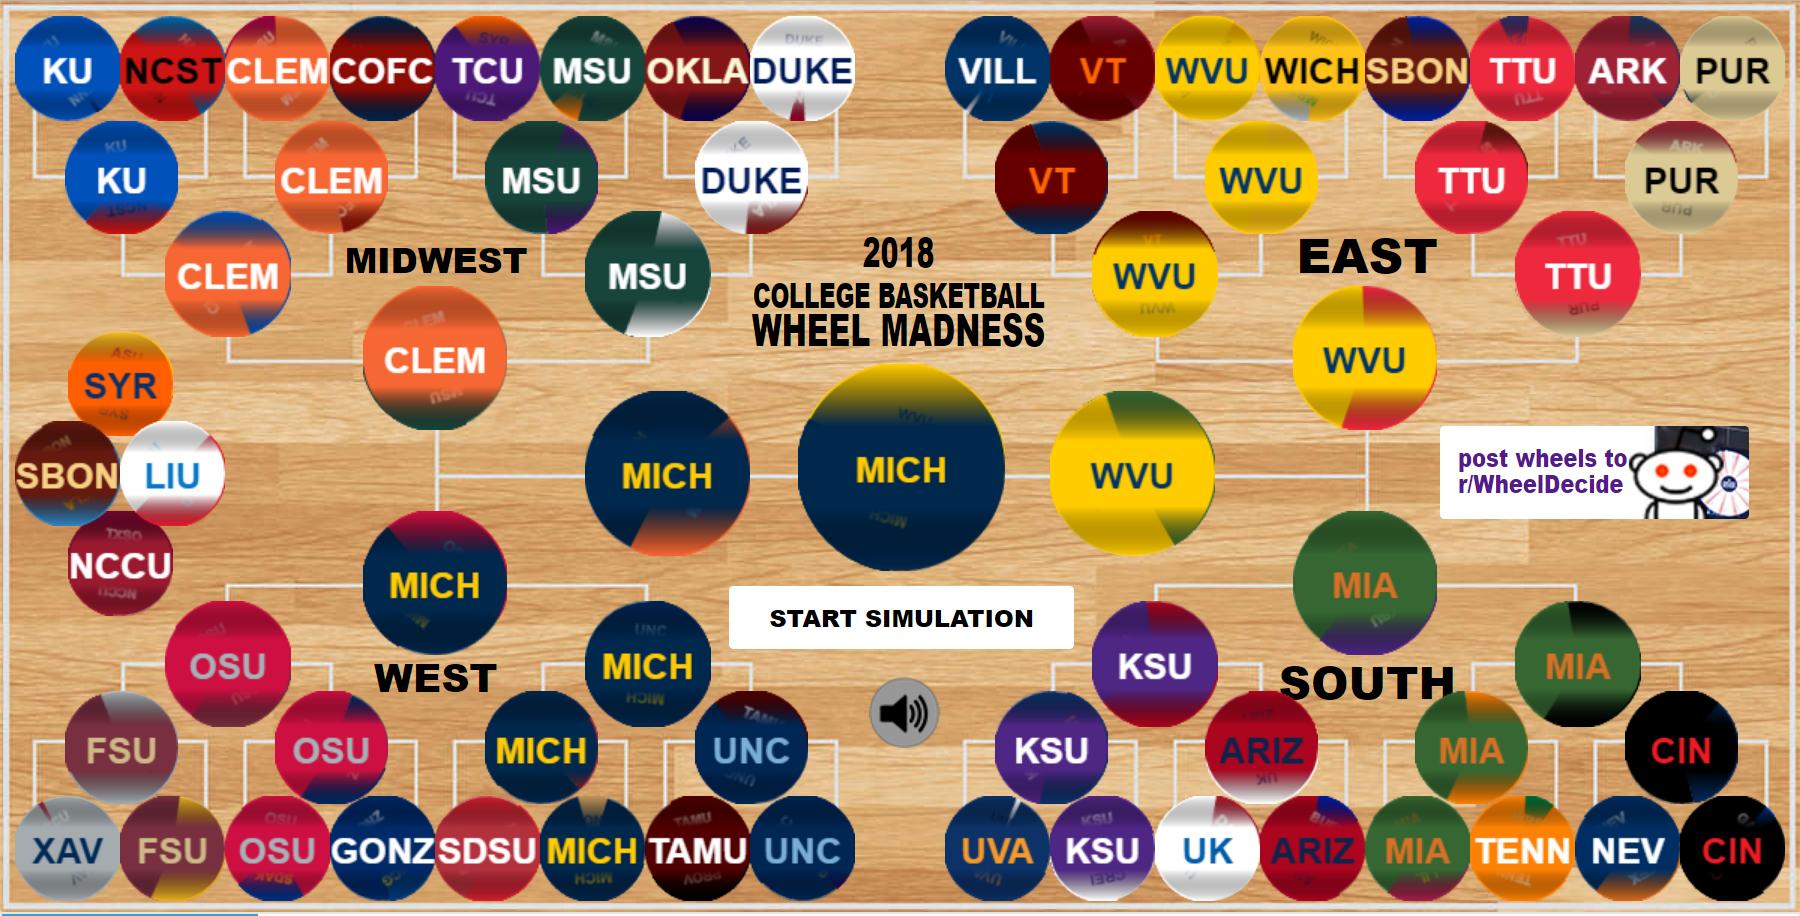 2018 College Basketball Wheel Madness Bracketology Simulator College Basketball Basketball College